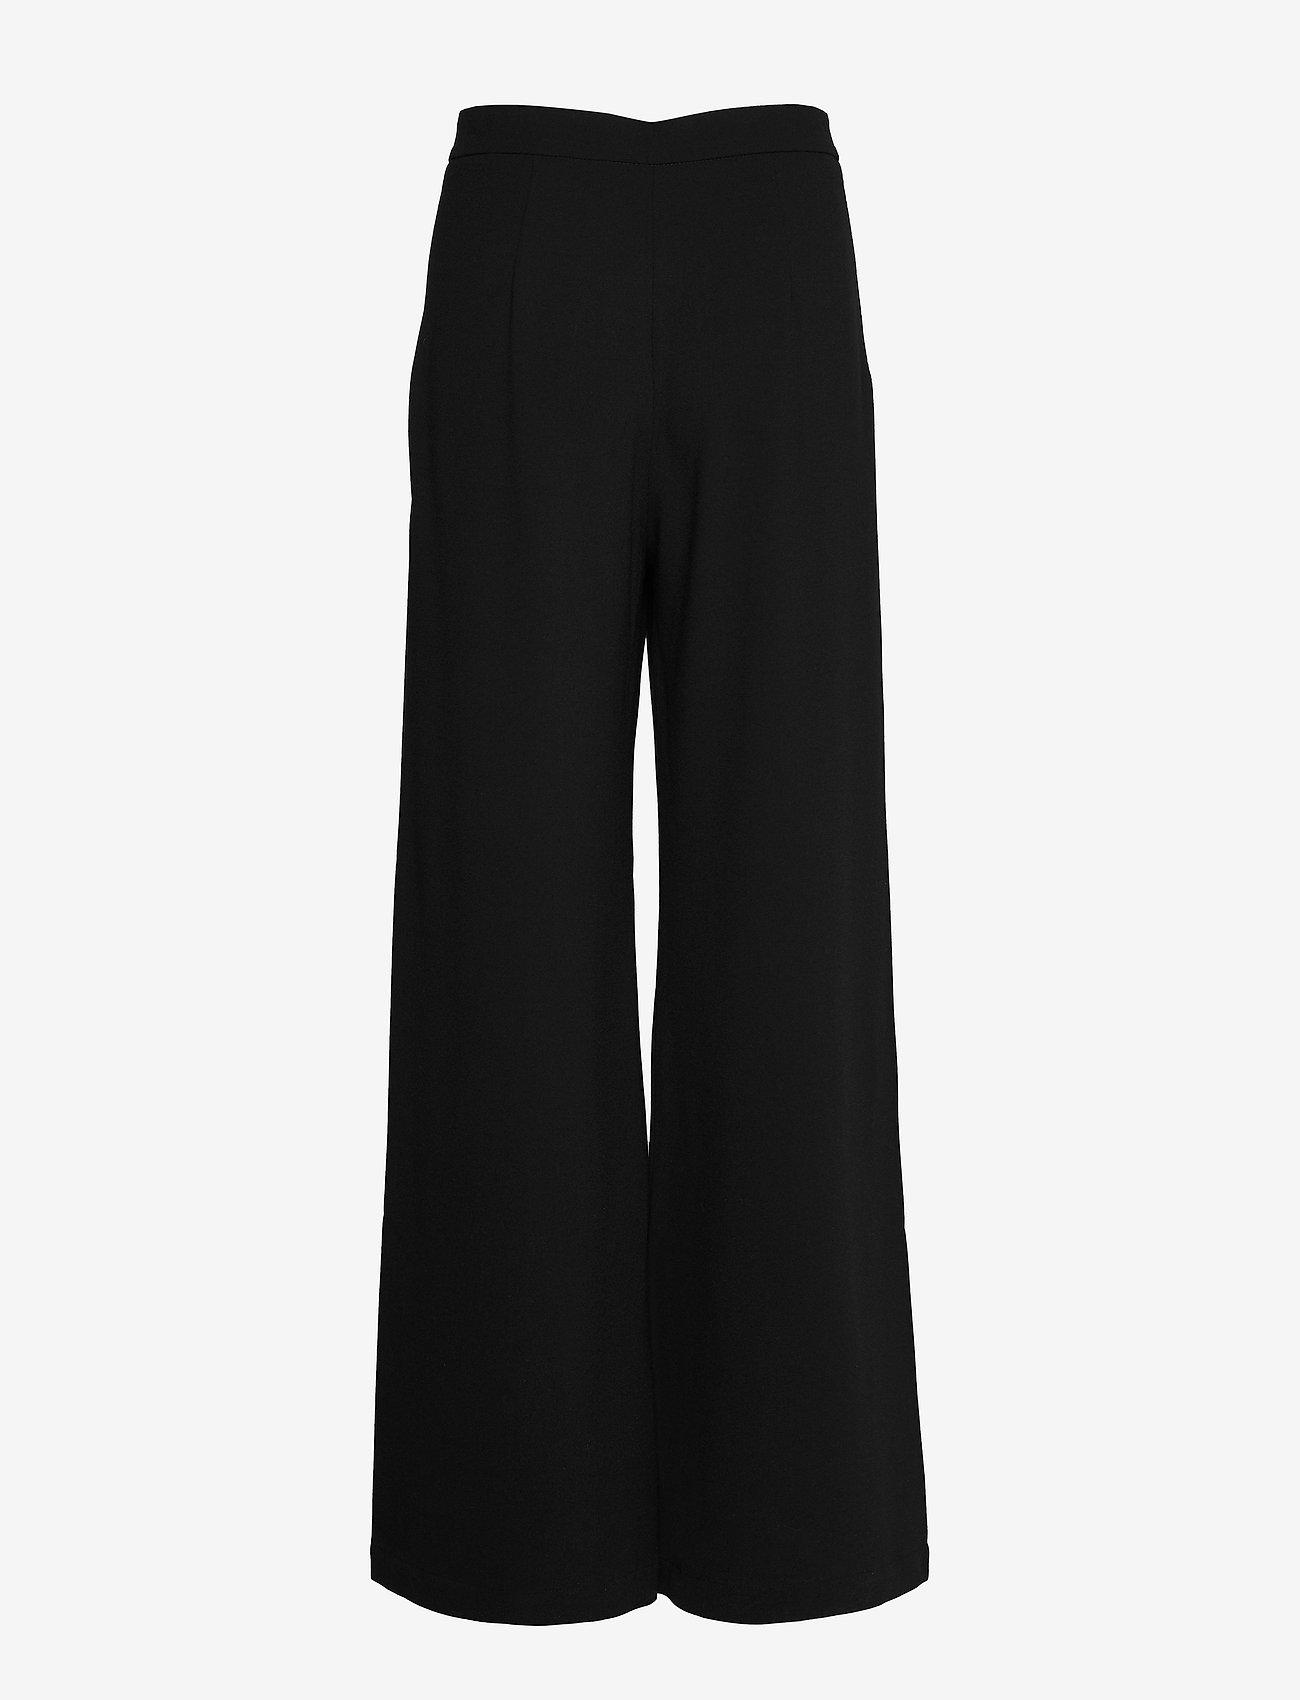 RODEBJER - SINI - bukser med brede ben - black - 1